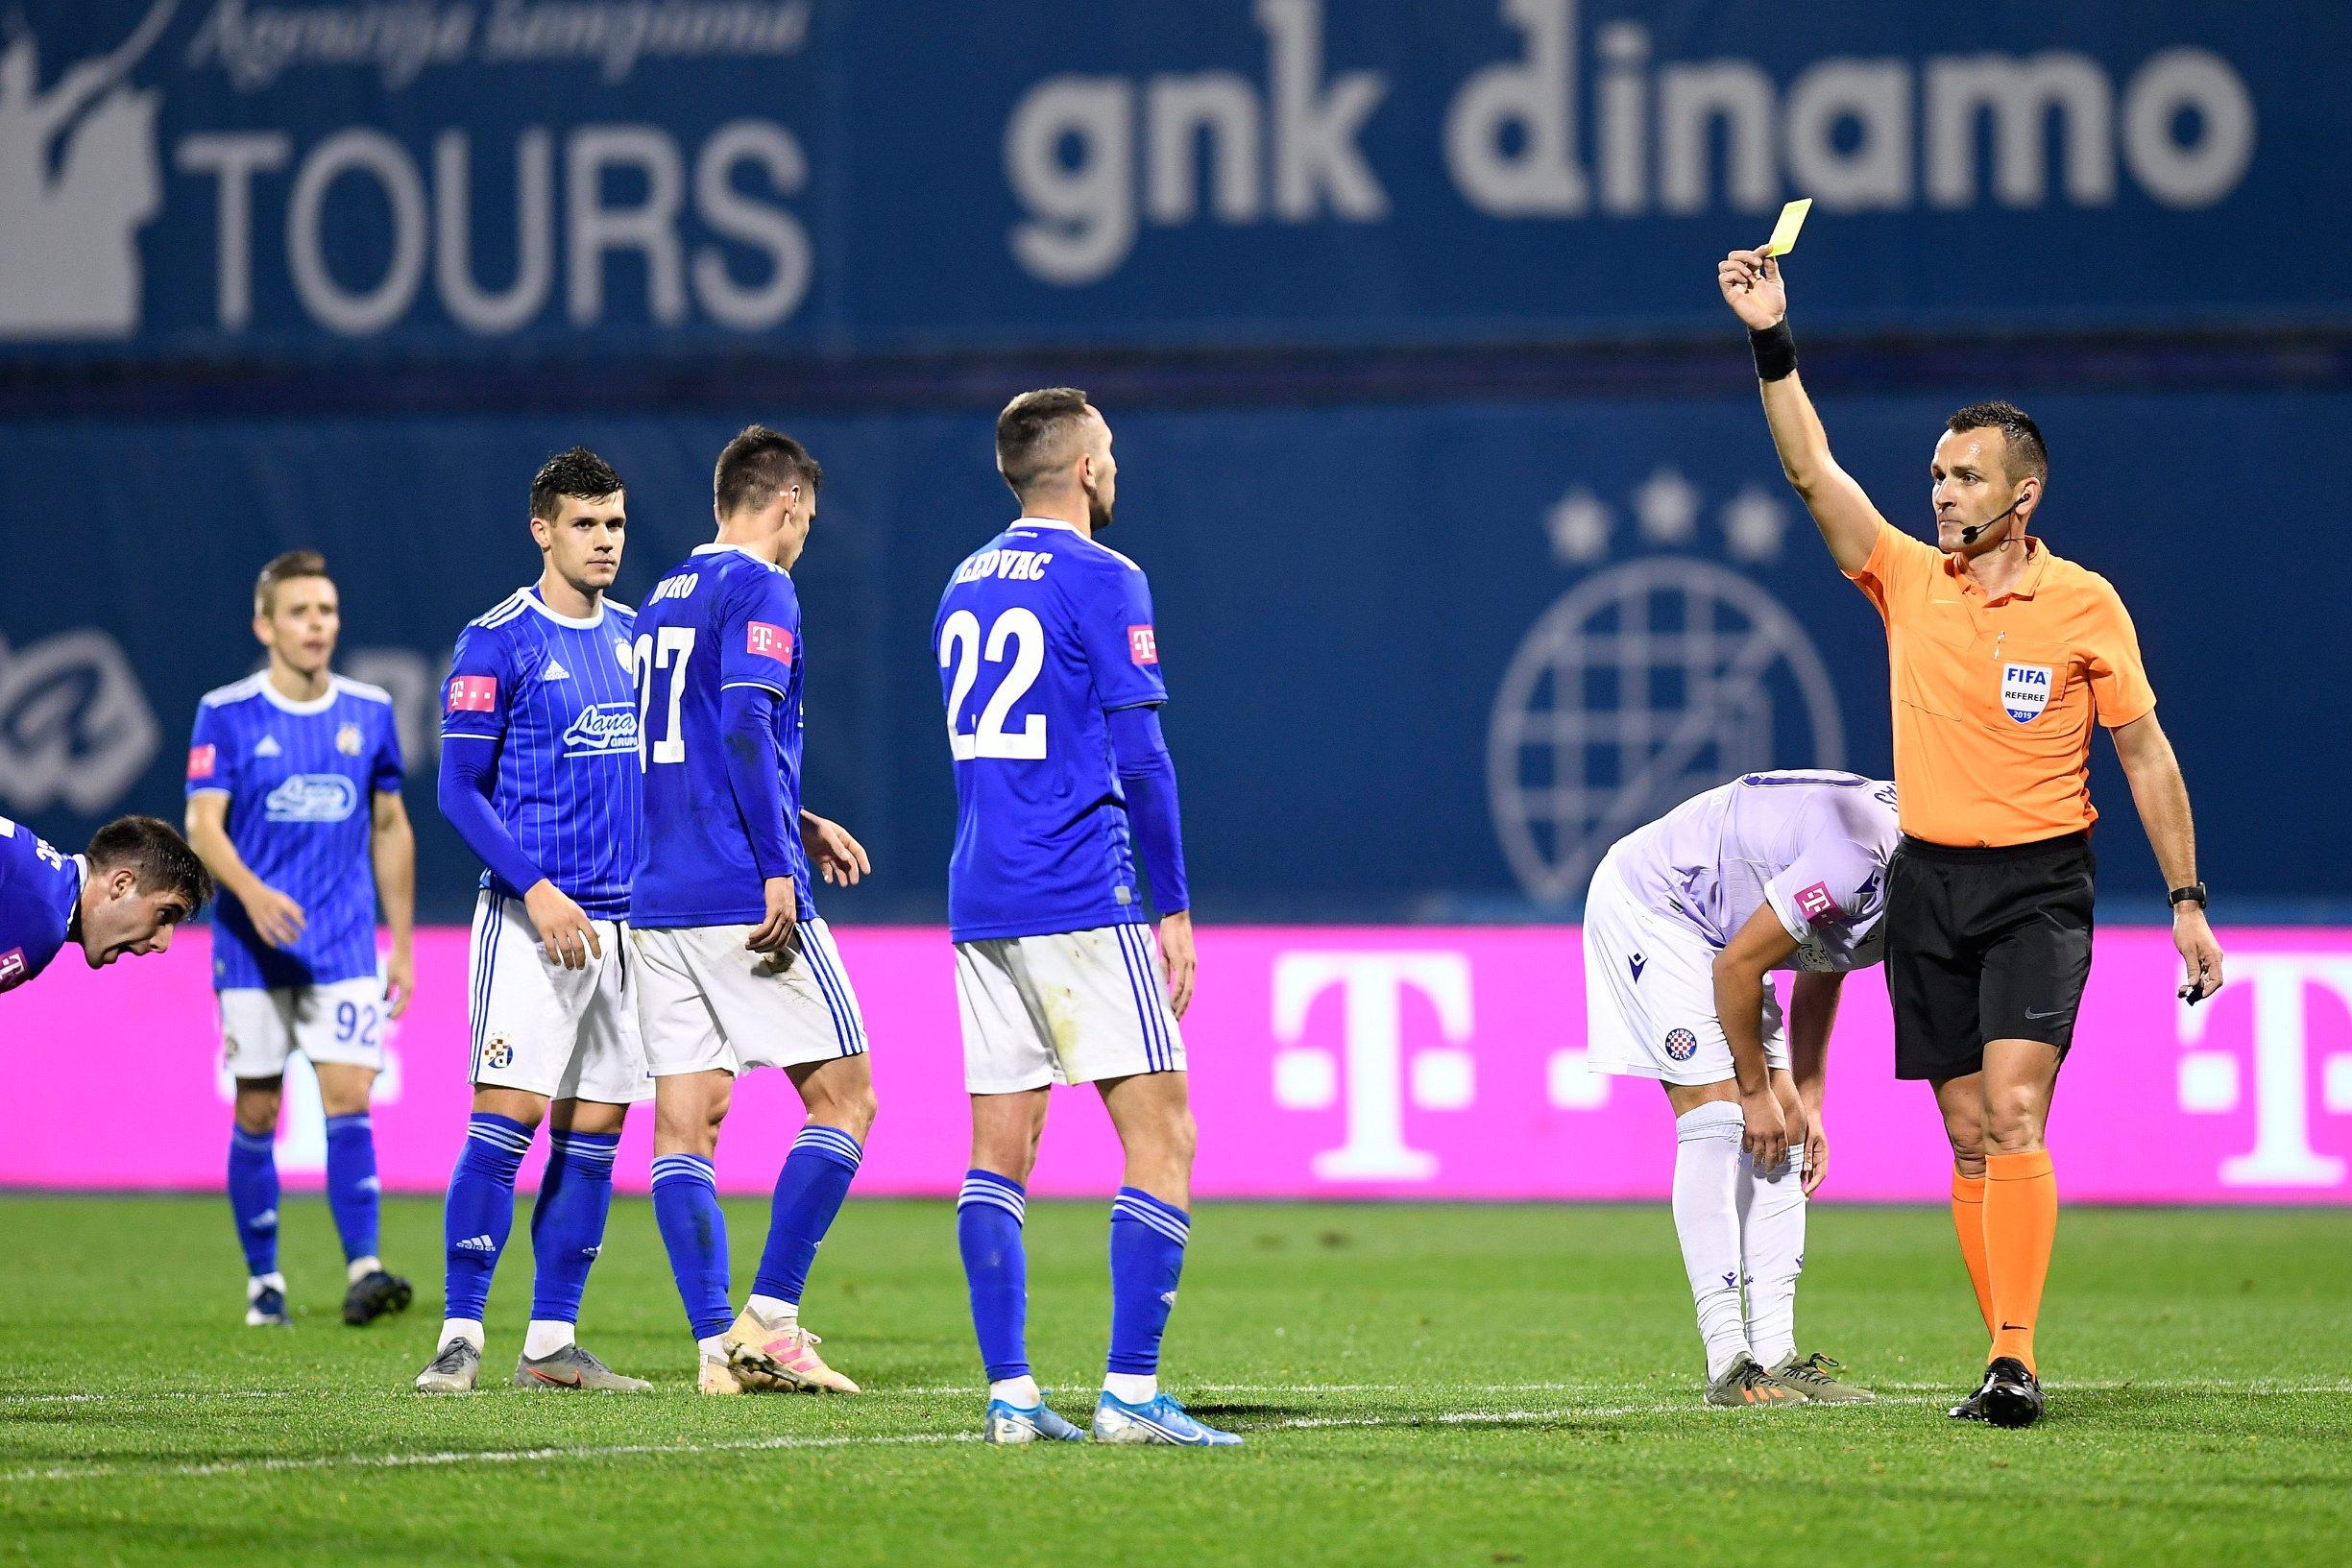 Bebek pokazuje žuti Leovcu nakon što je dosudio penal za Hajduk